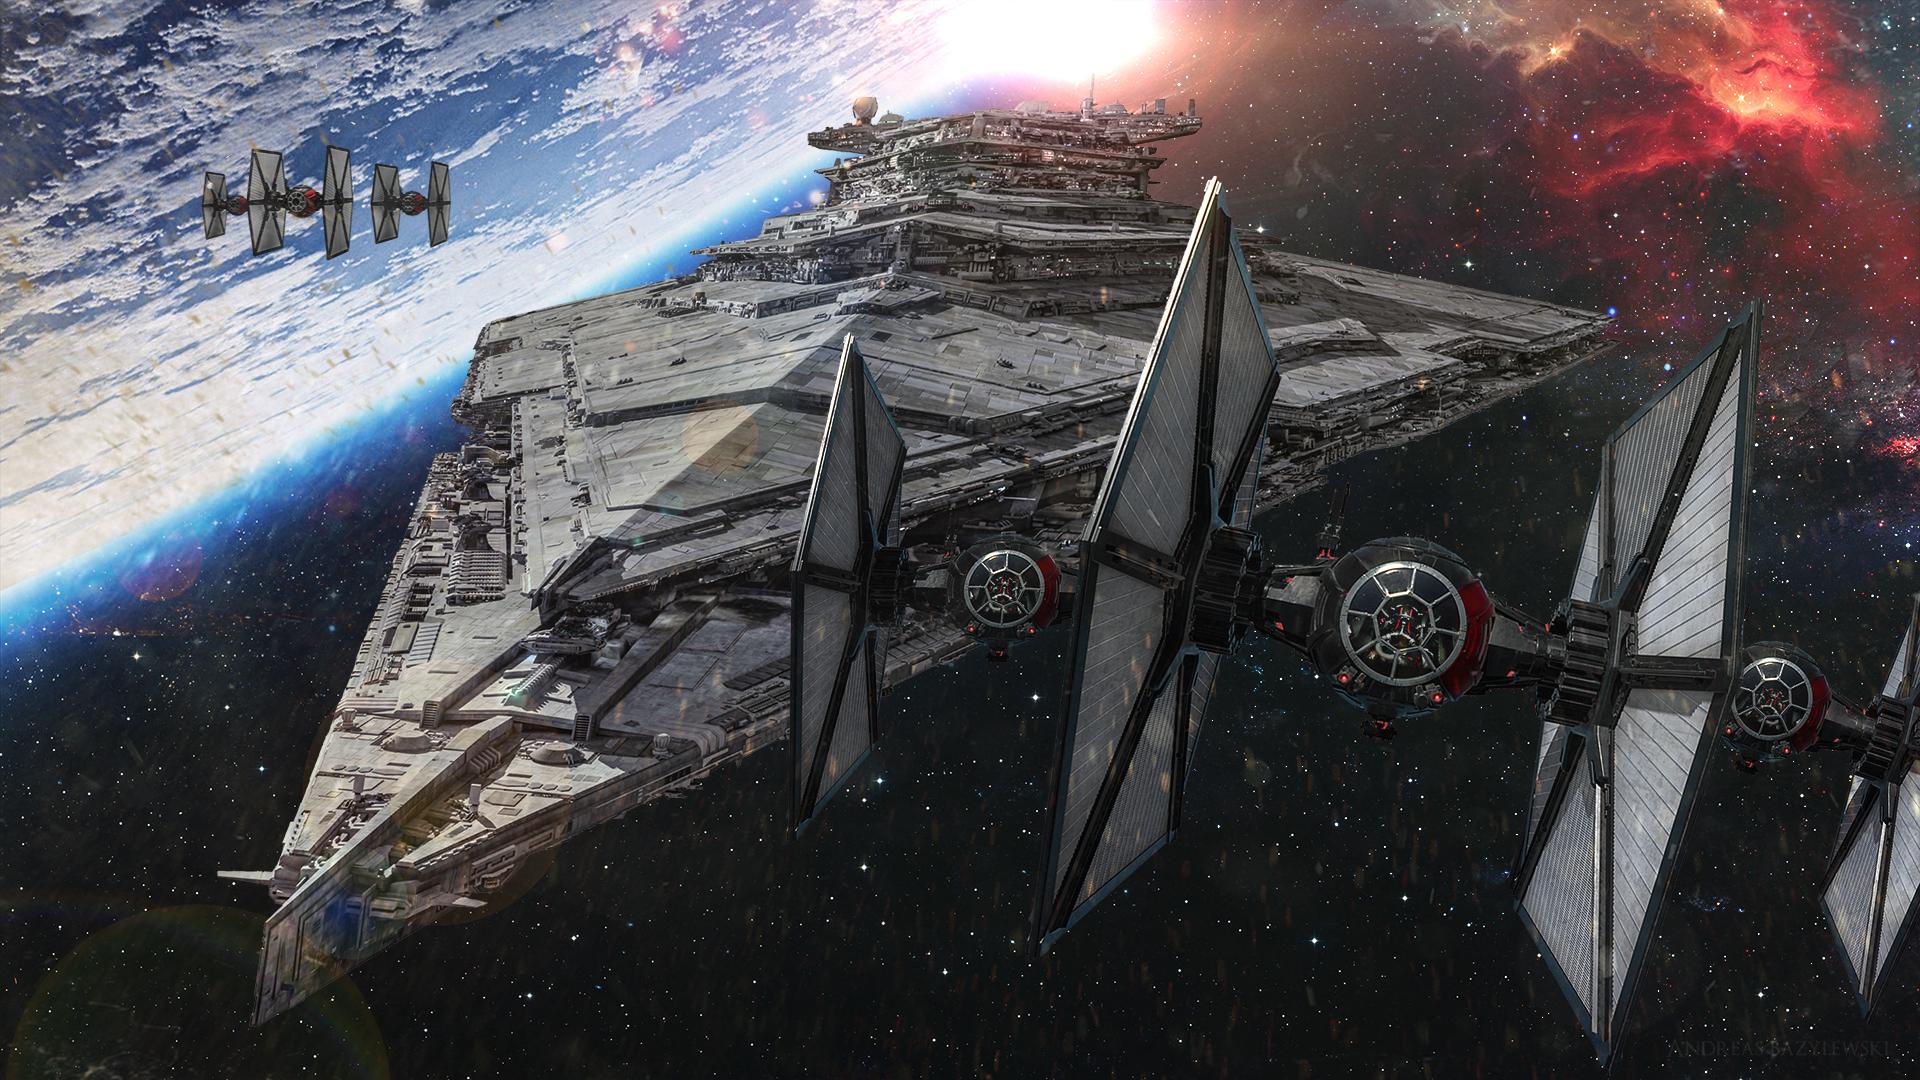 Star Wars: The Force Awakens Desktop Wallpapers - Album on Imgur